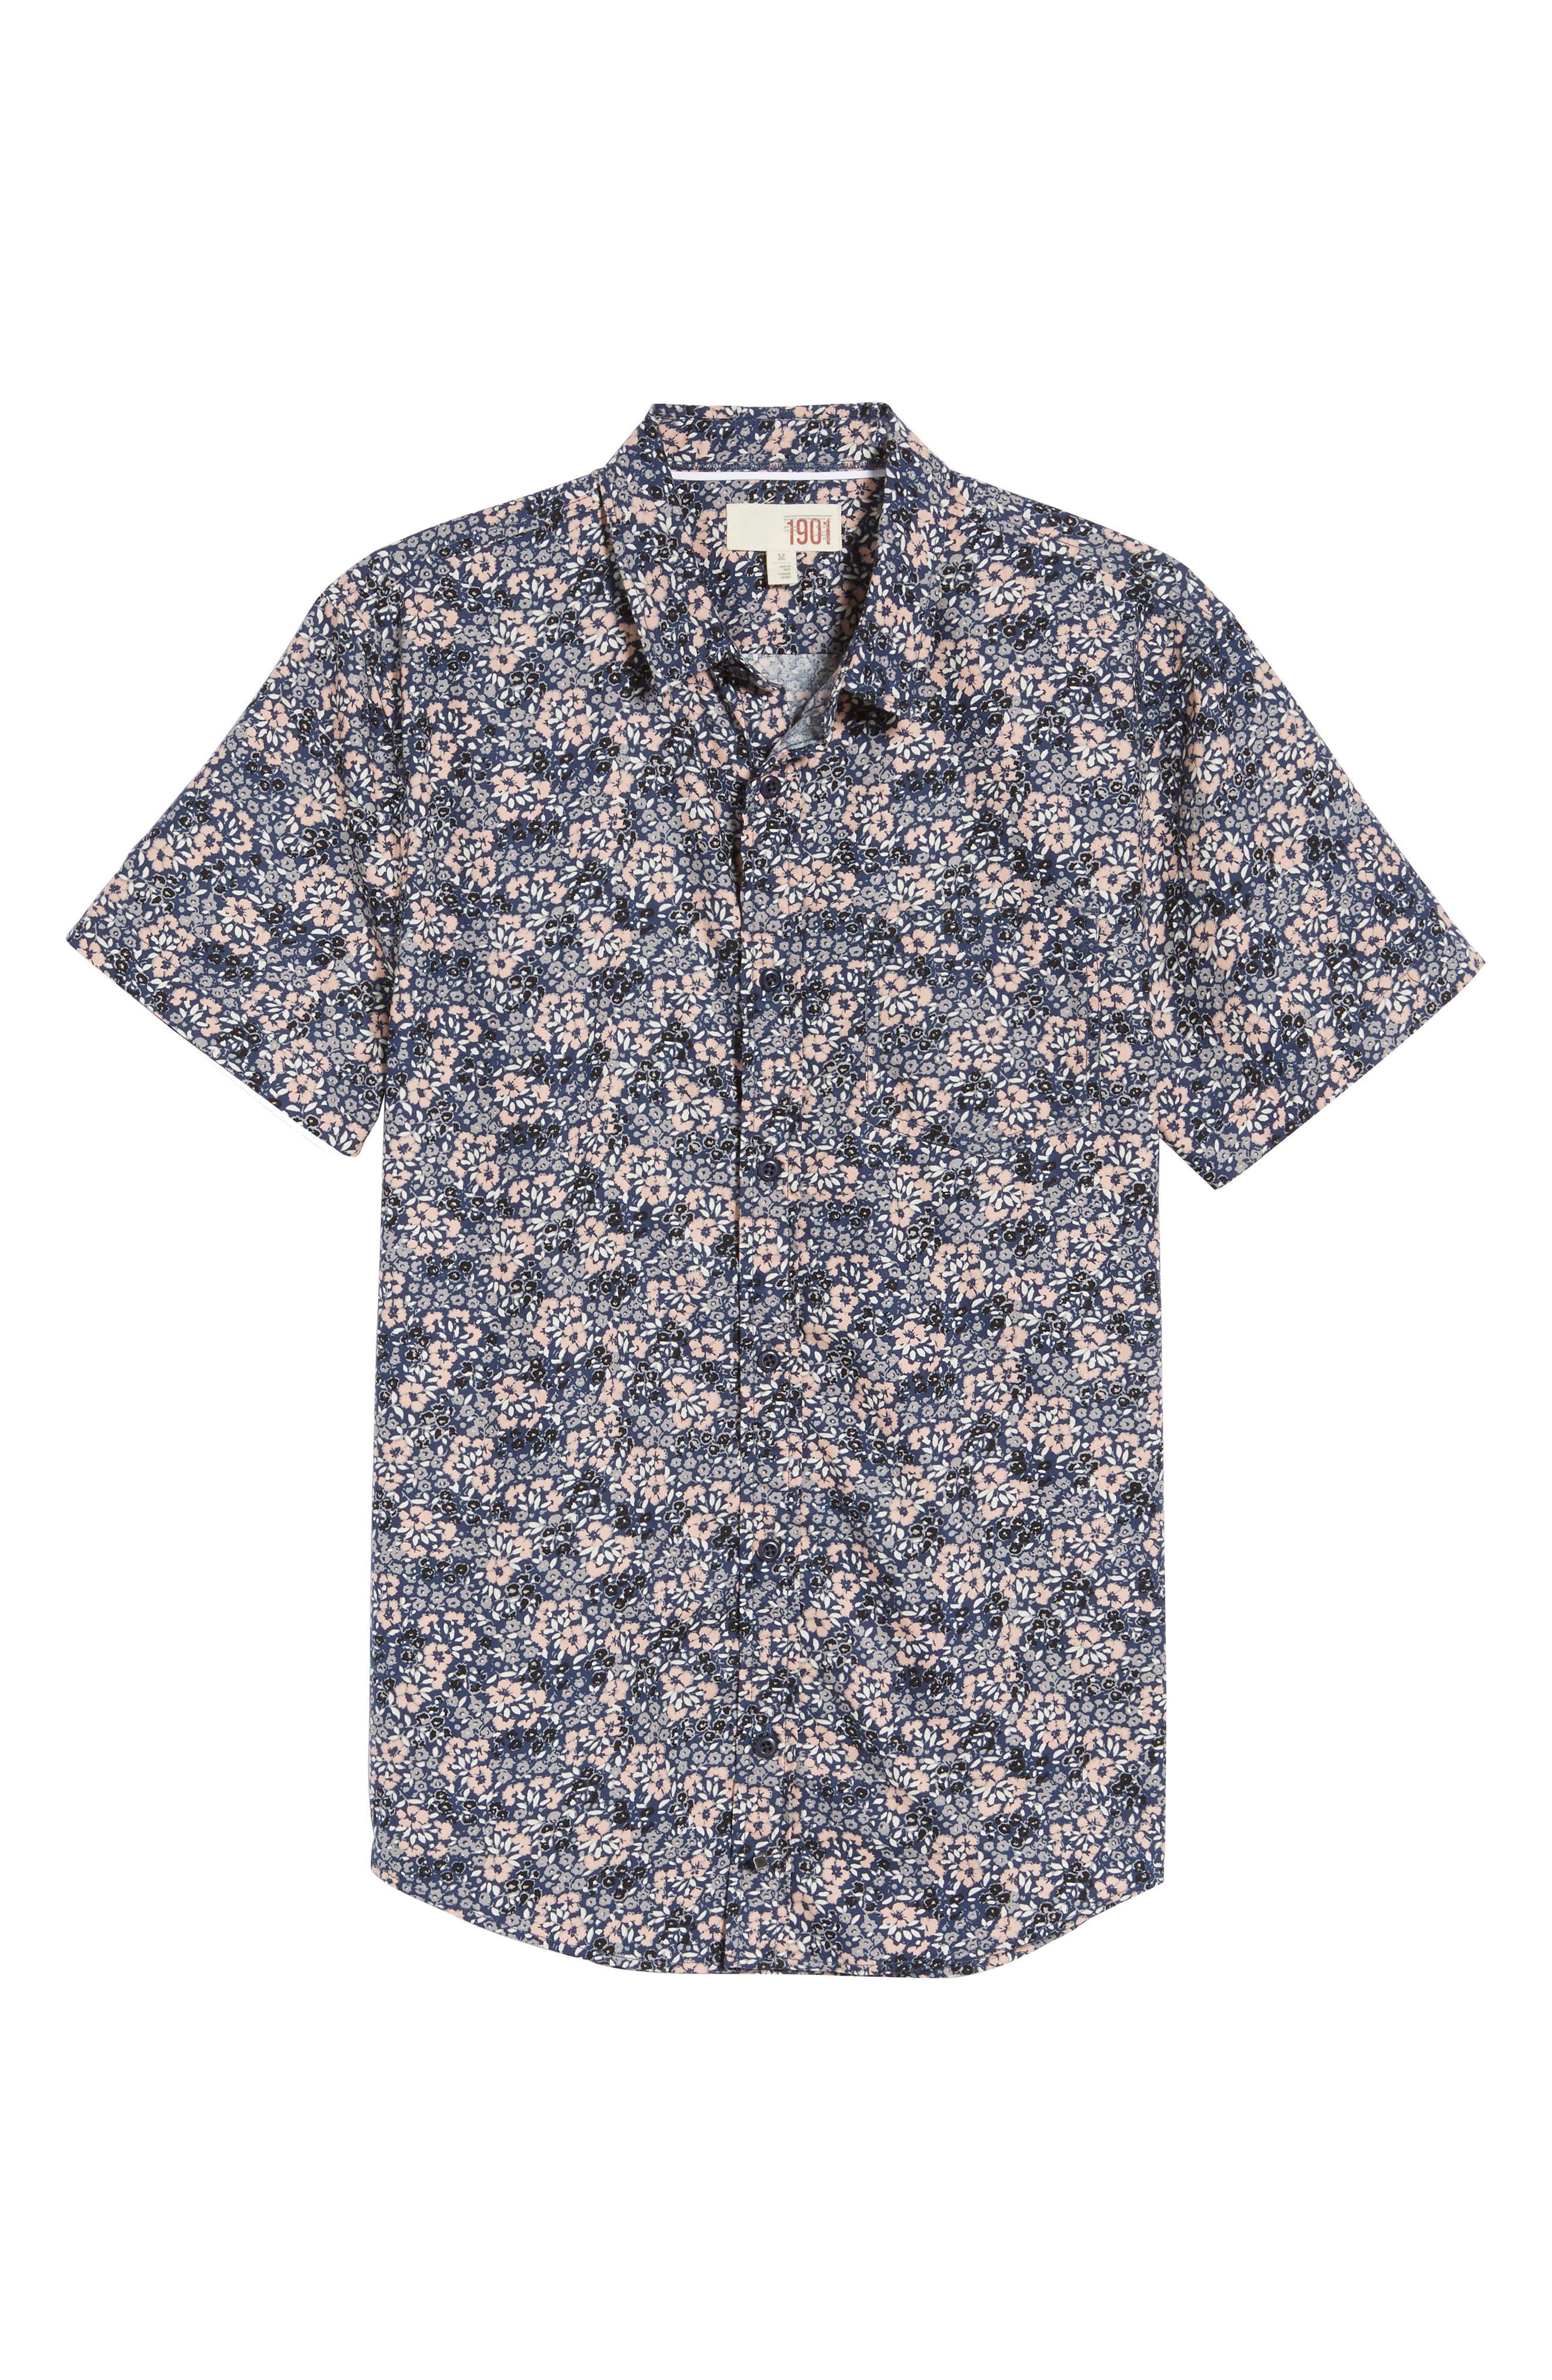 Poplin Floral Shirt,                             Alternate thumbnail 6, color,                             Navy Peacoat Simple Floral